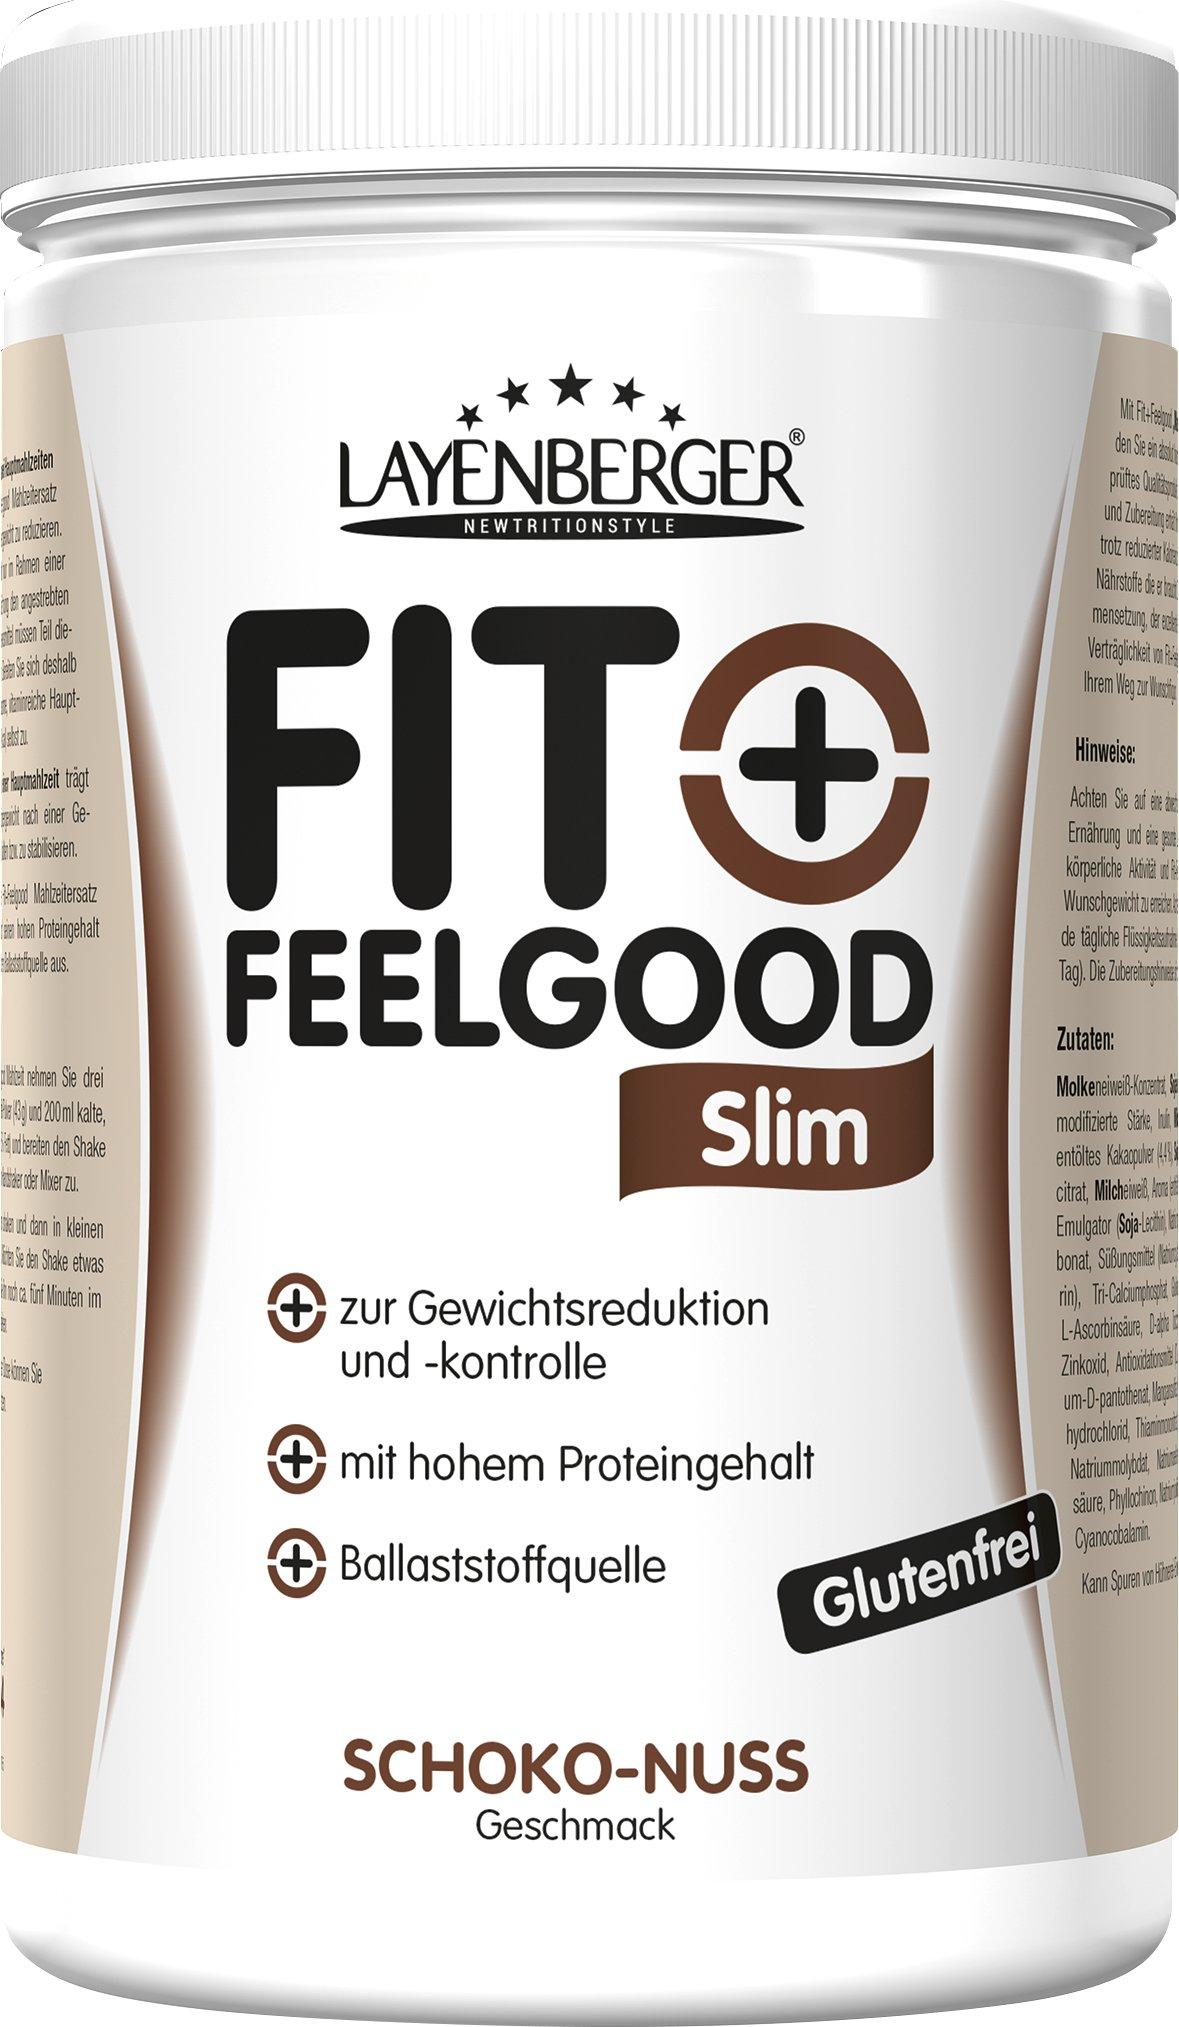 Layenberger® Fit + Feelgood Slim Schoko-Nuss